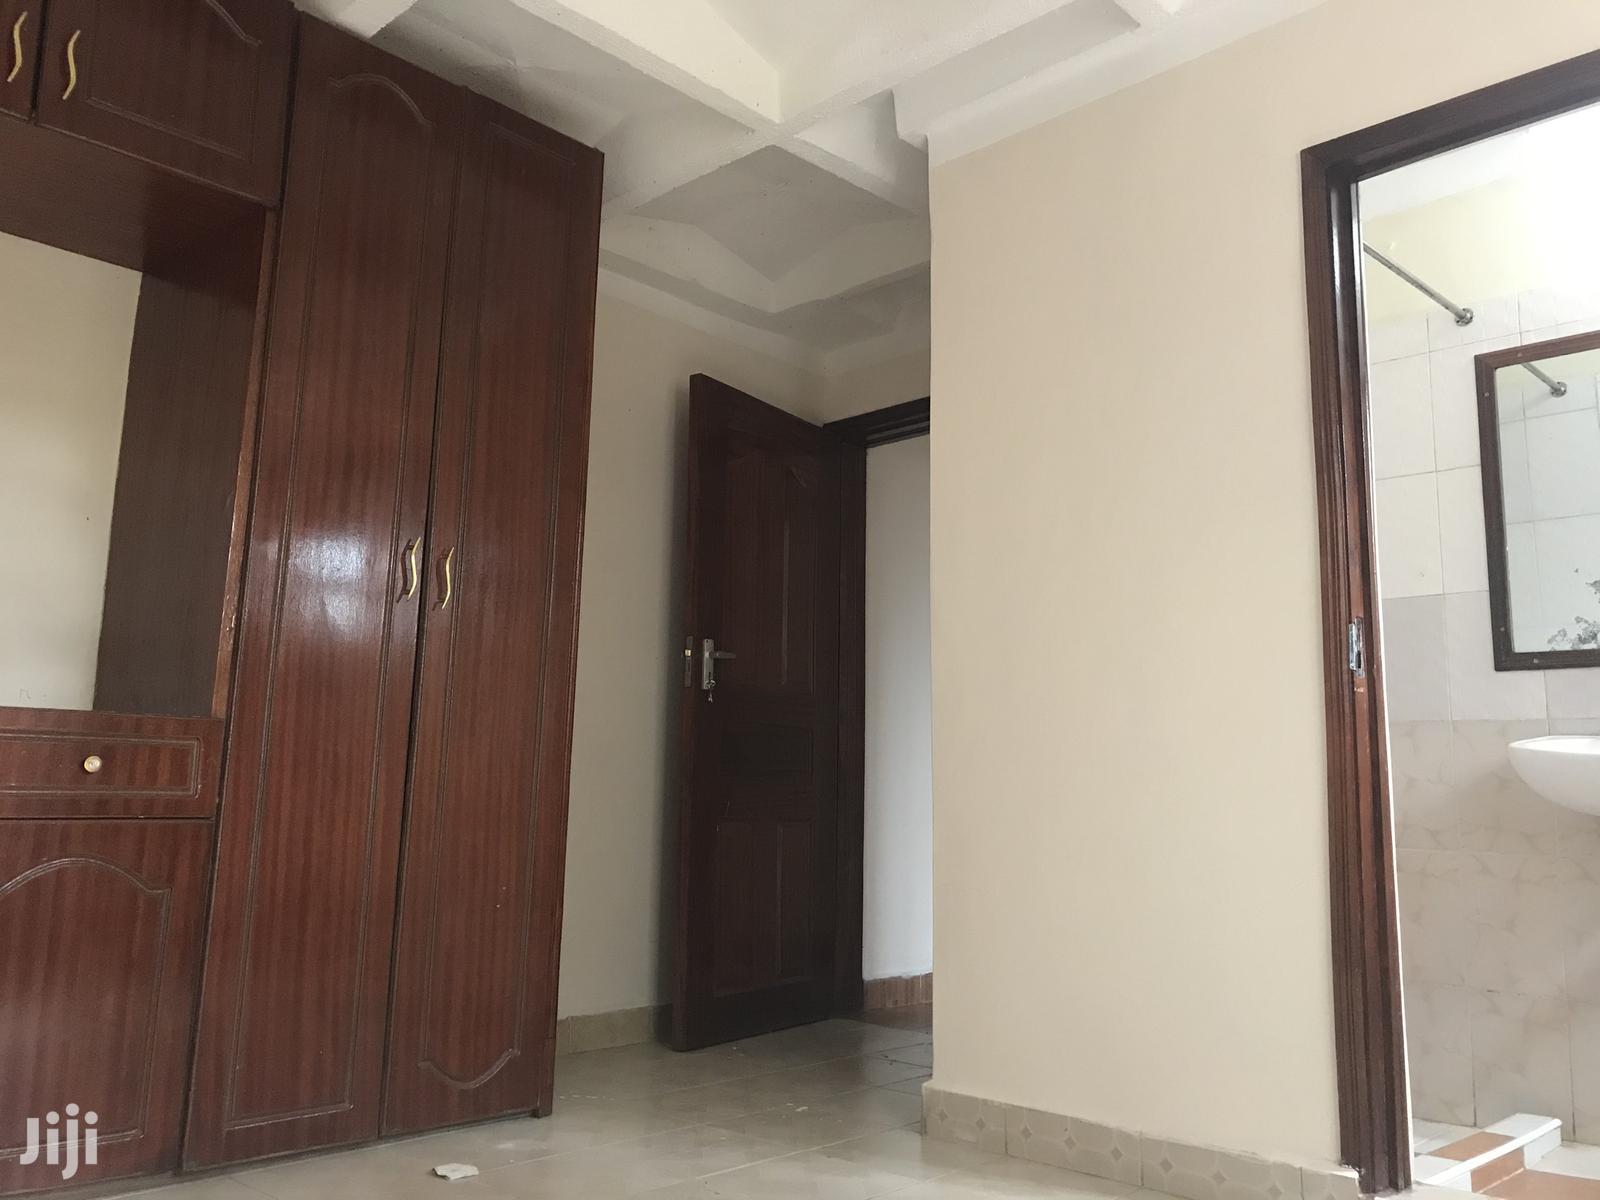 5br All Einsuite Syokimau   Houses & Apartments For Rent for sale in Syokimau/Mulolongo, Machakos, Kenya